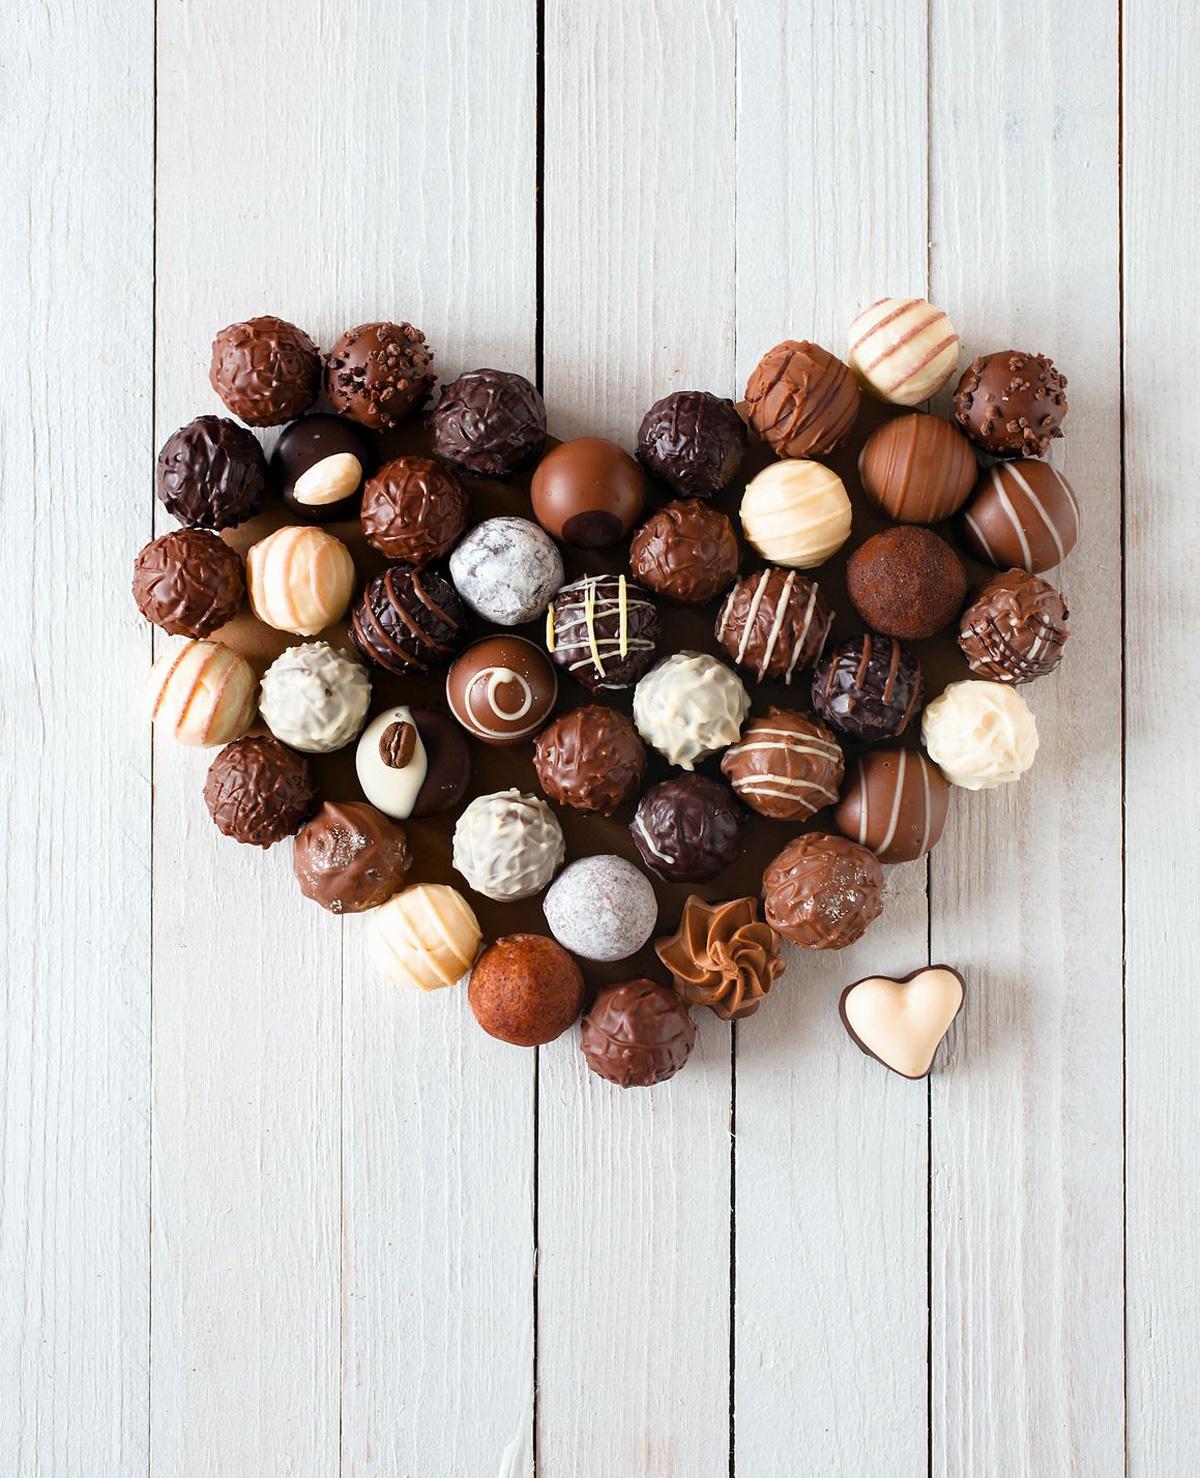 Dagmenu Mieke: Chocoladedag